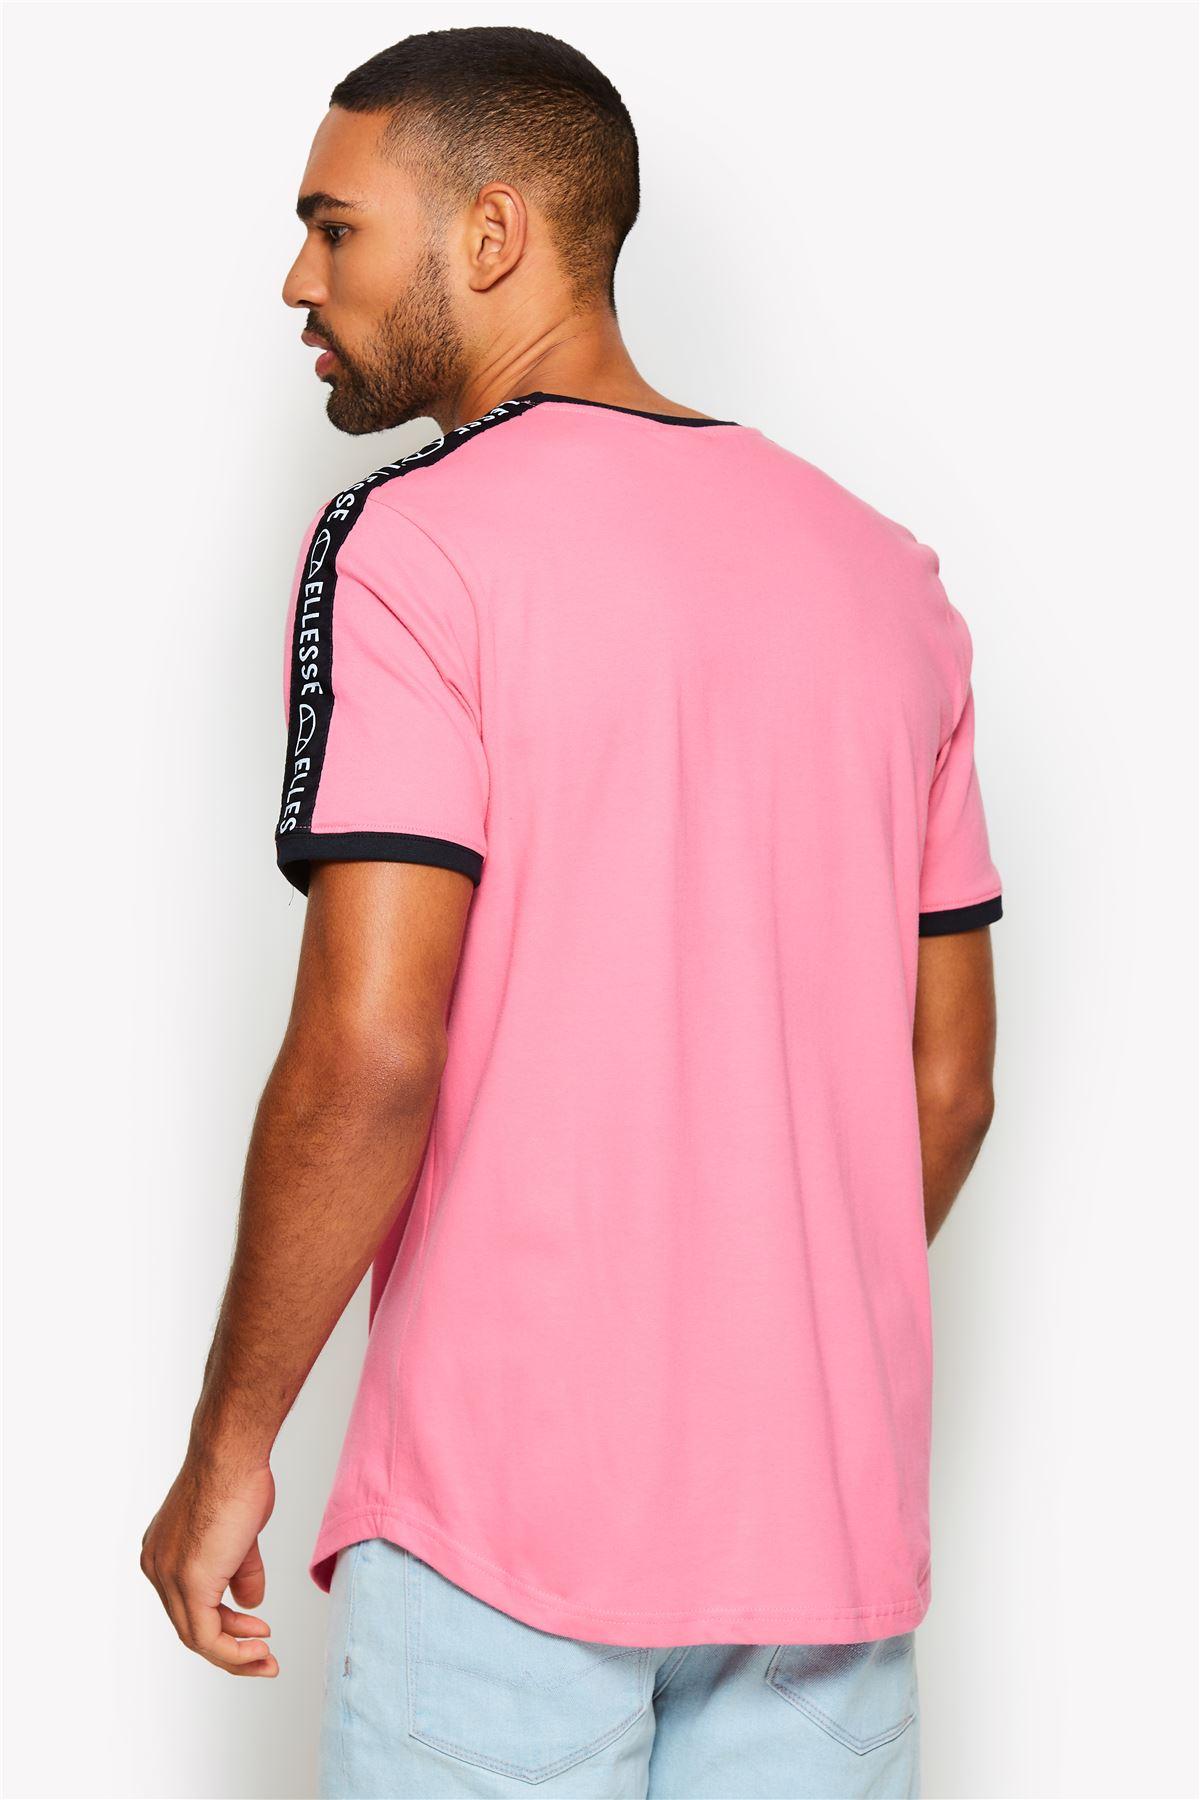 Pink /& White Ellesse Fede Cotton Crew Neck Taped Shoulder Retro T-Shirt Blue